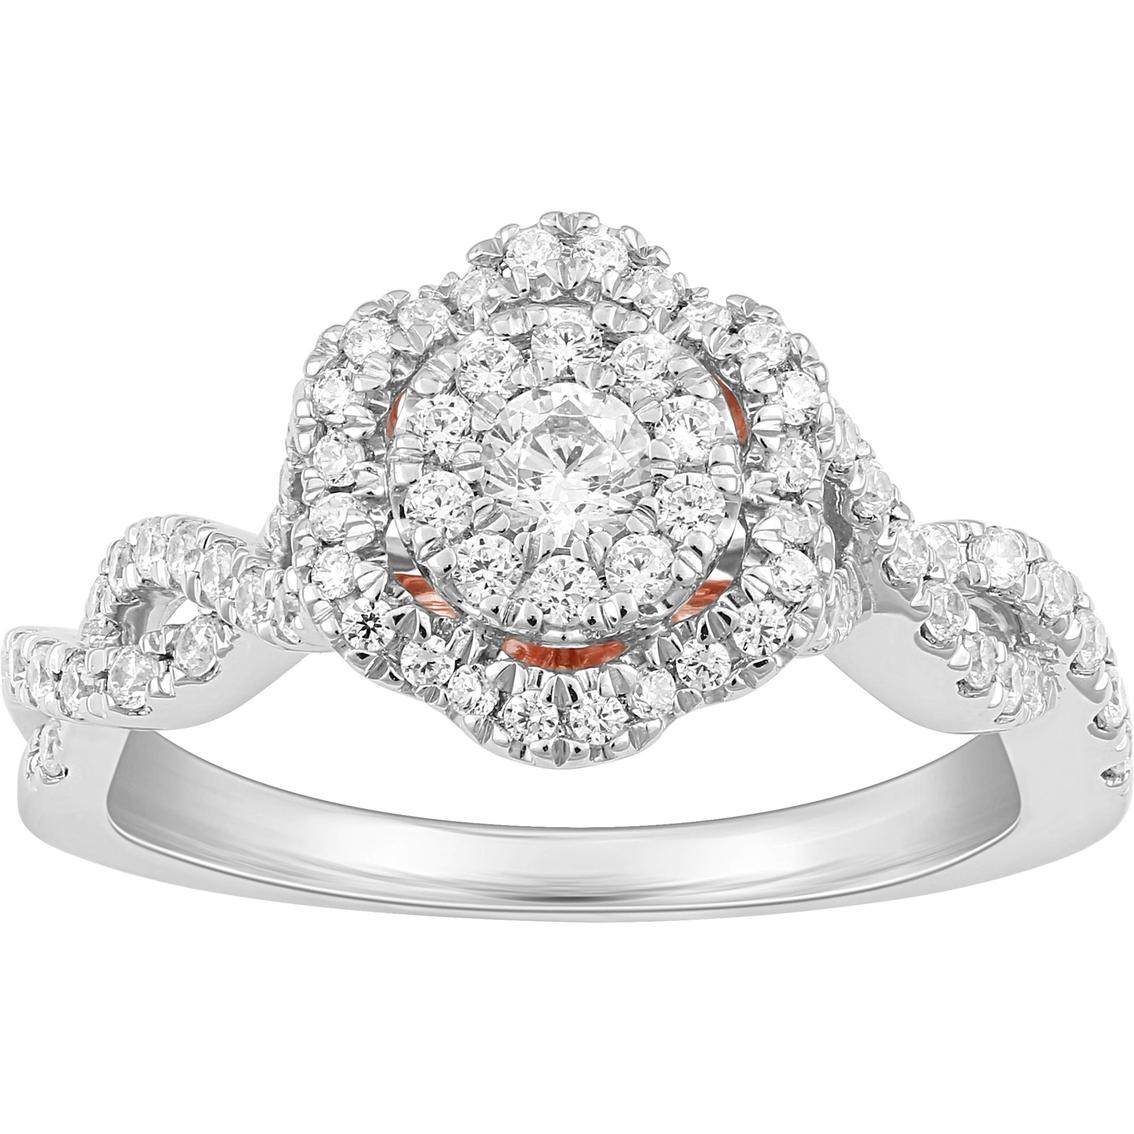 Disney Enchanted 14K White And Rose Gold 5 8 CTW Diamond Belle Bridal Ring